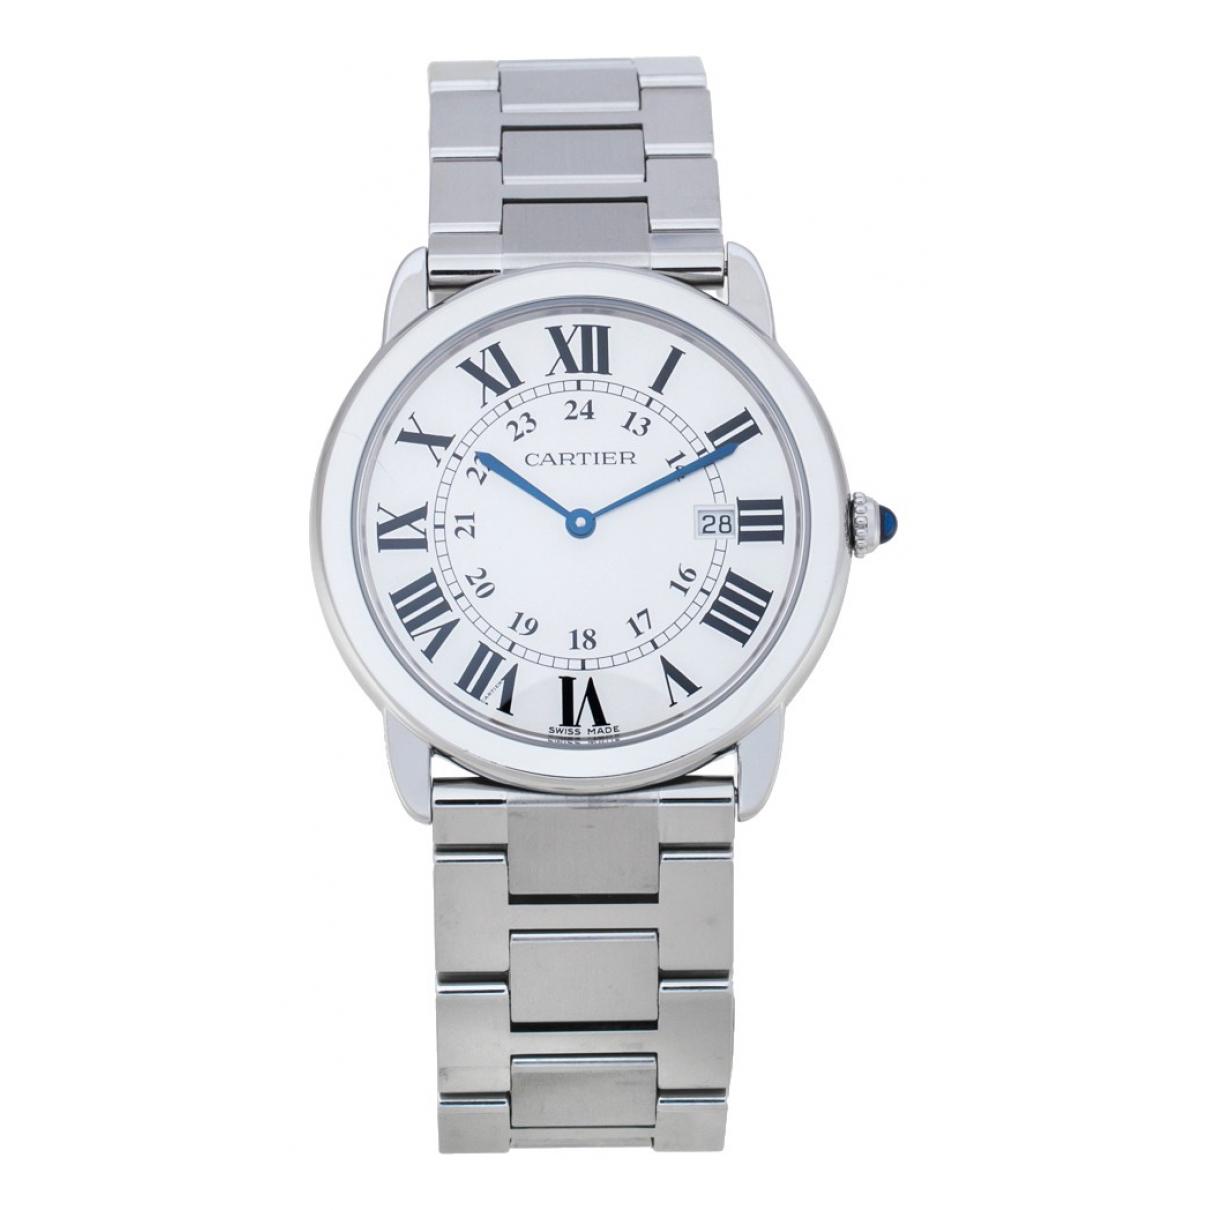 Relojes Ronde Solo Cartier